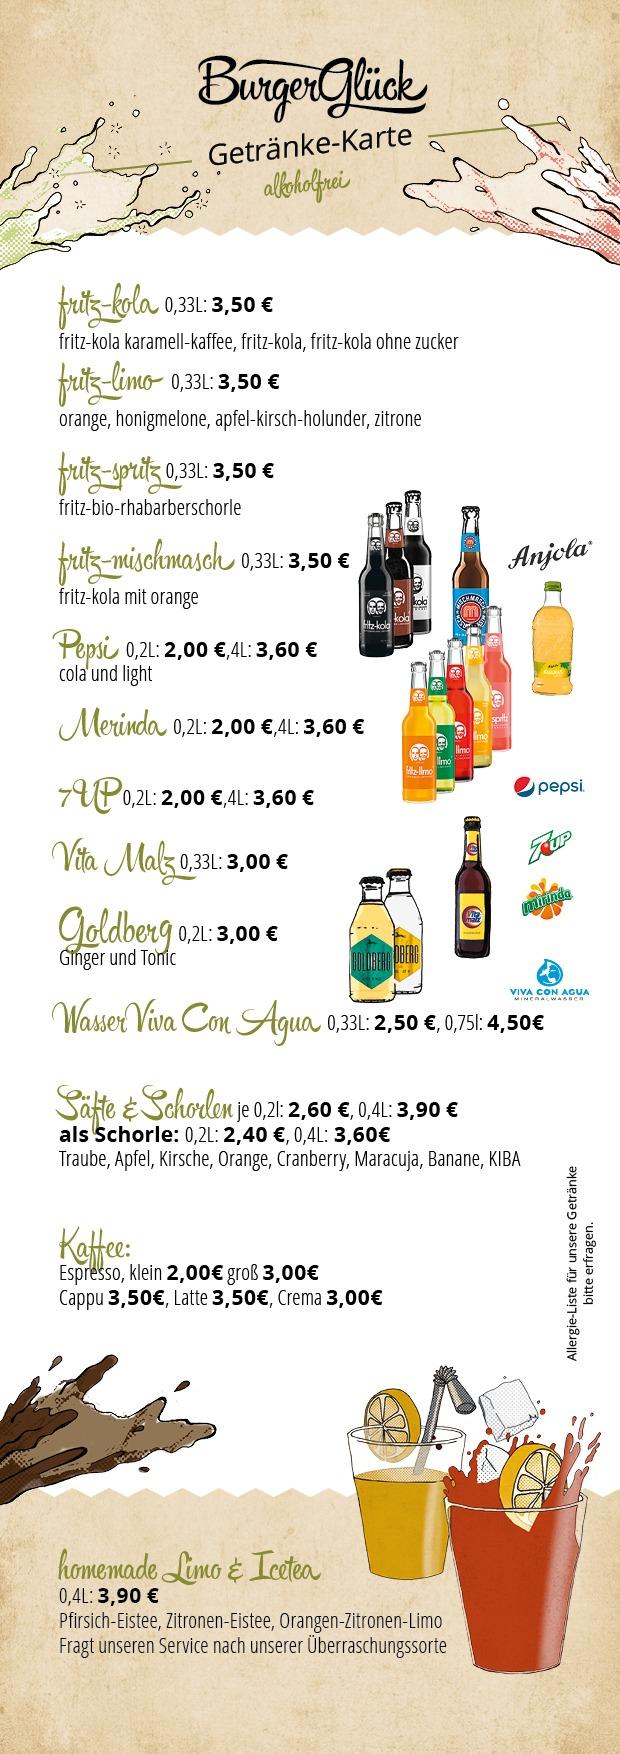 Burgerglück Getränkekarte Restaurant Teil 1